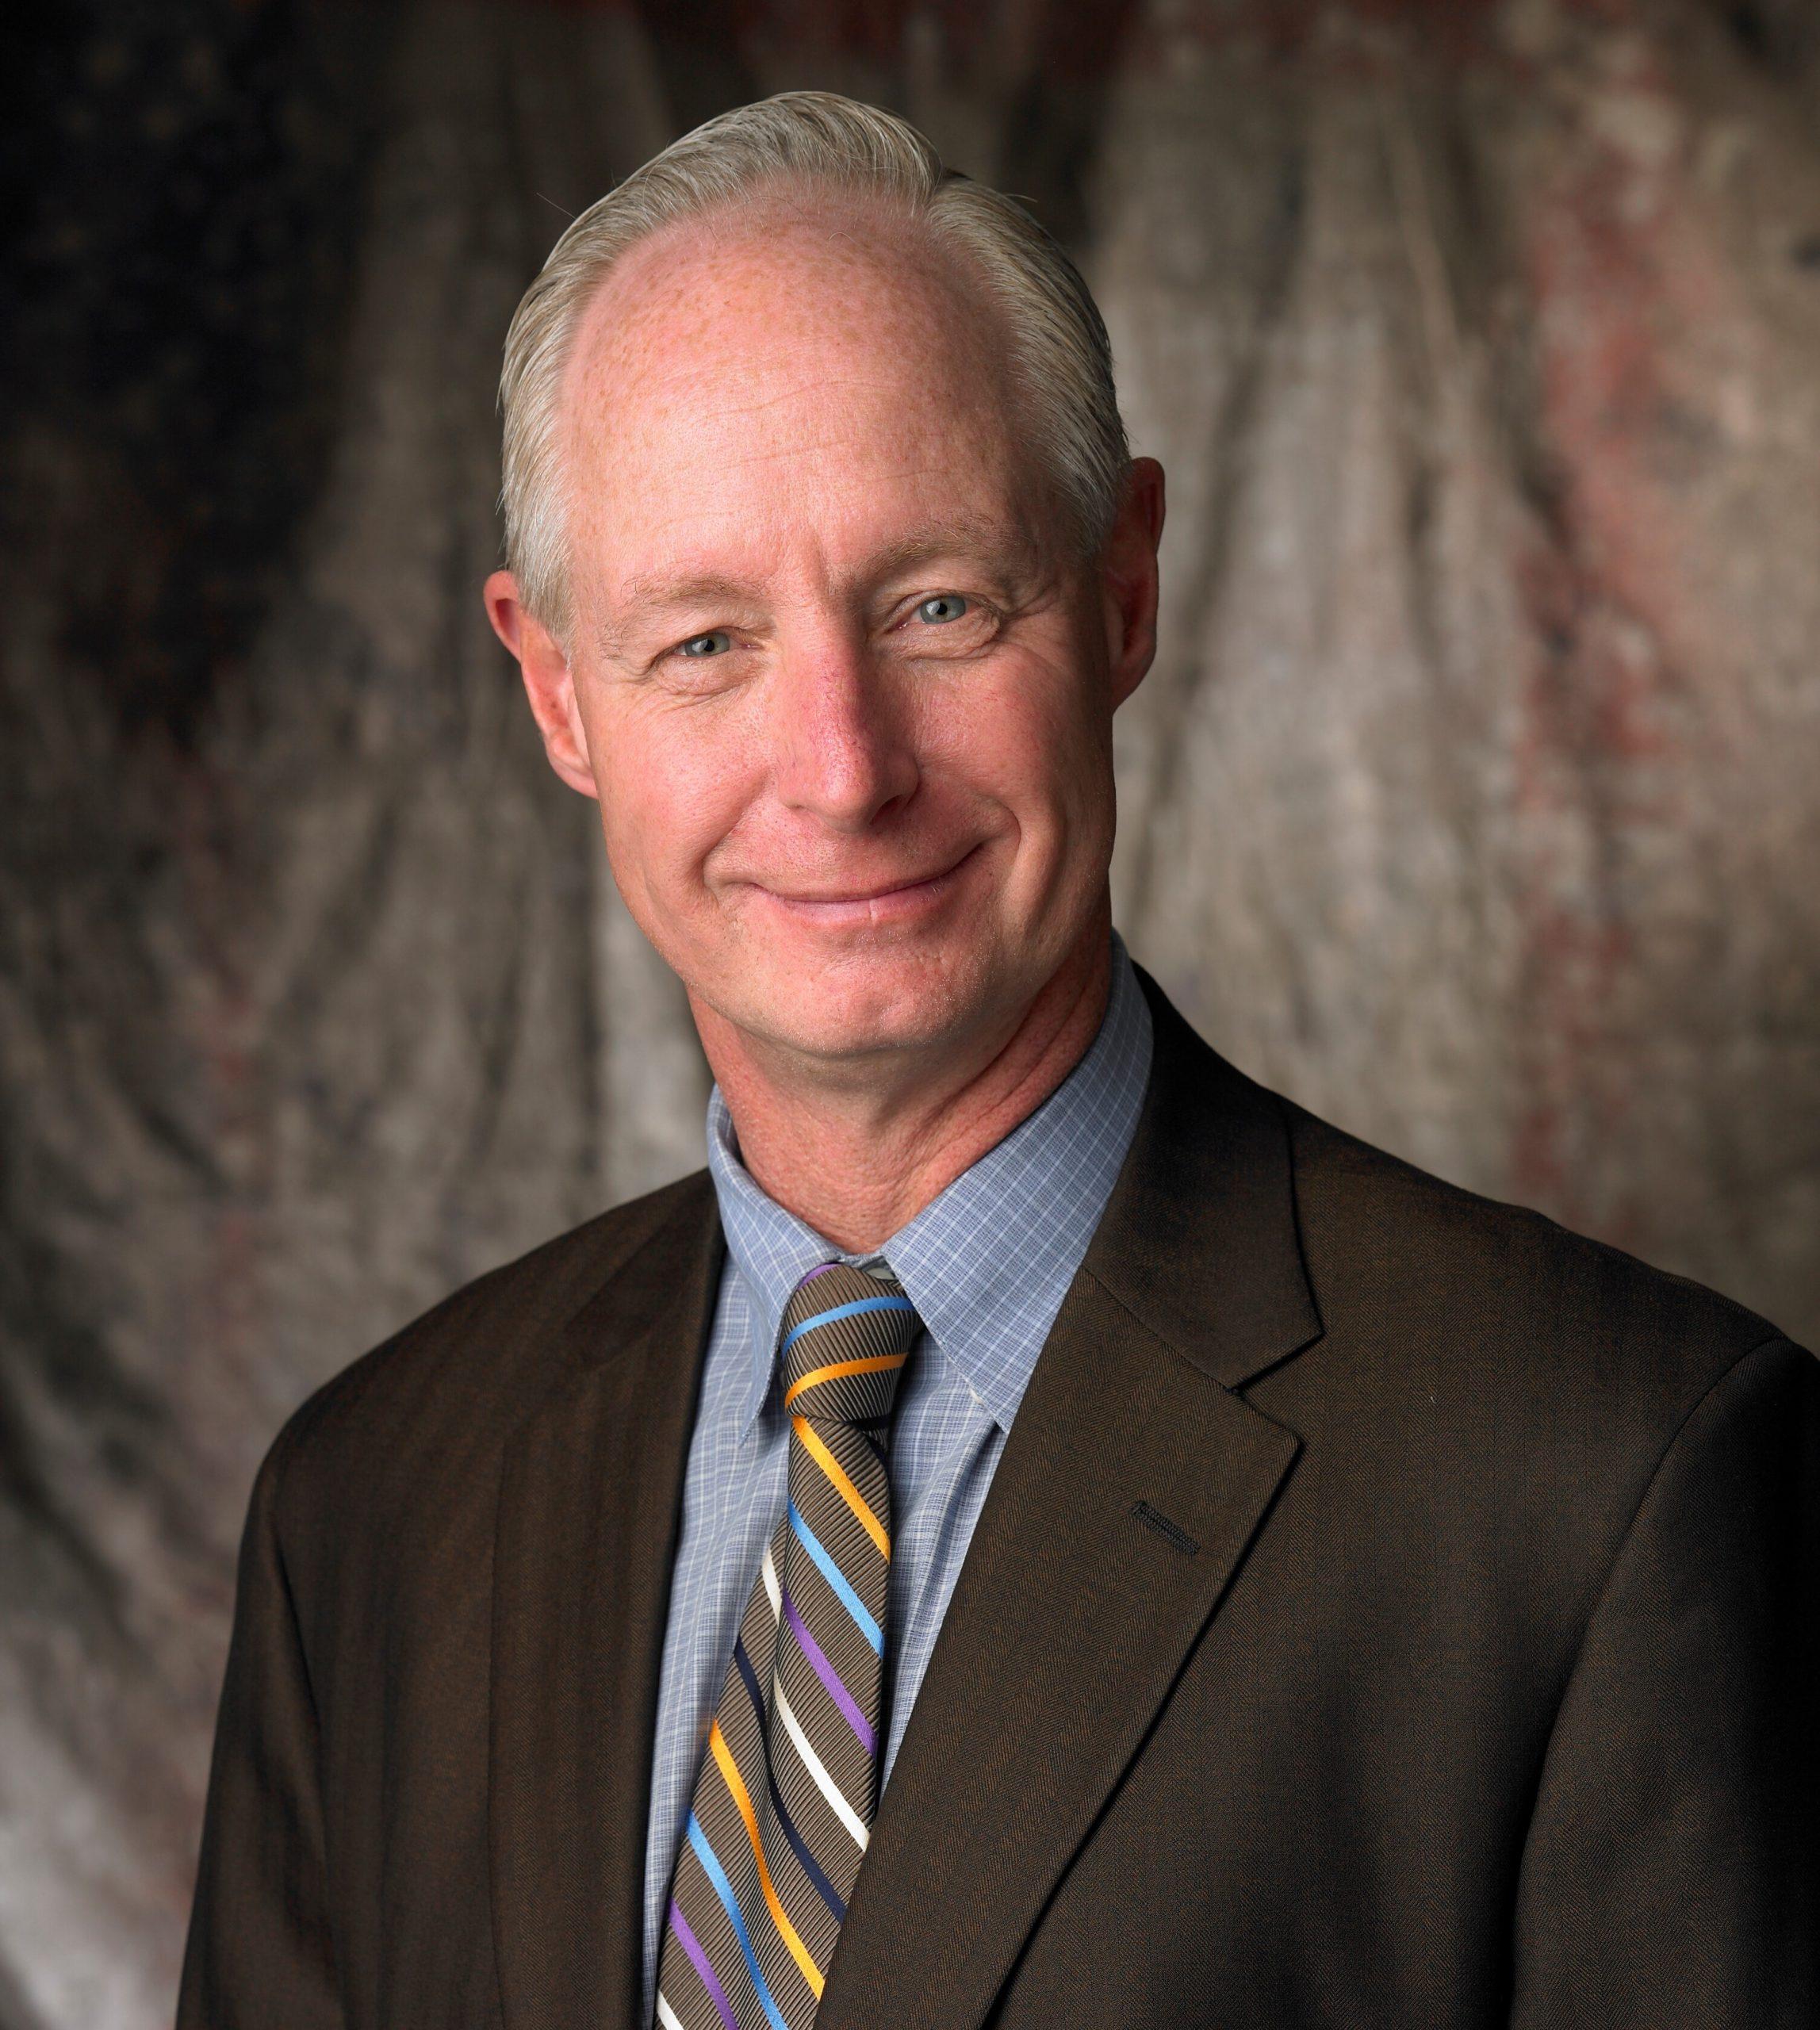 Keith A. Kemper